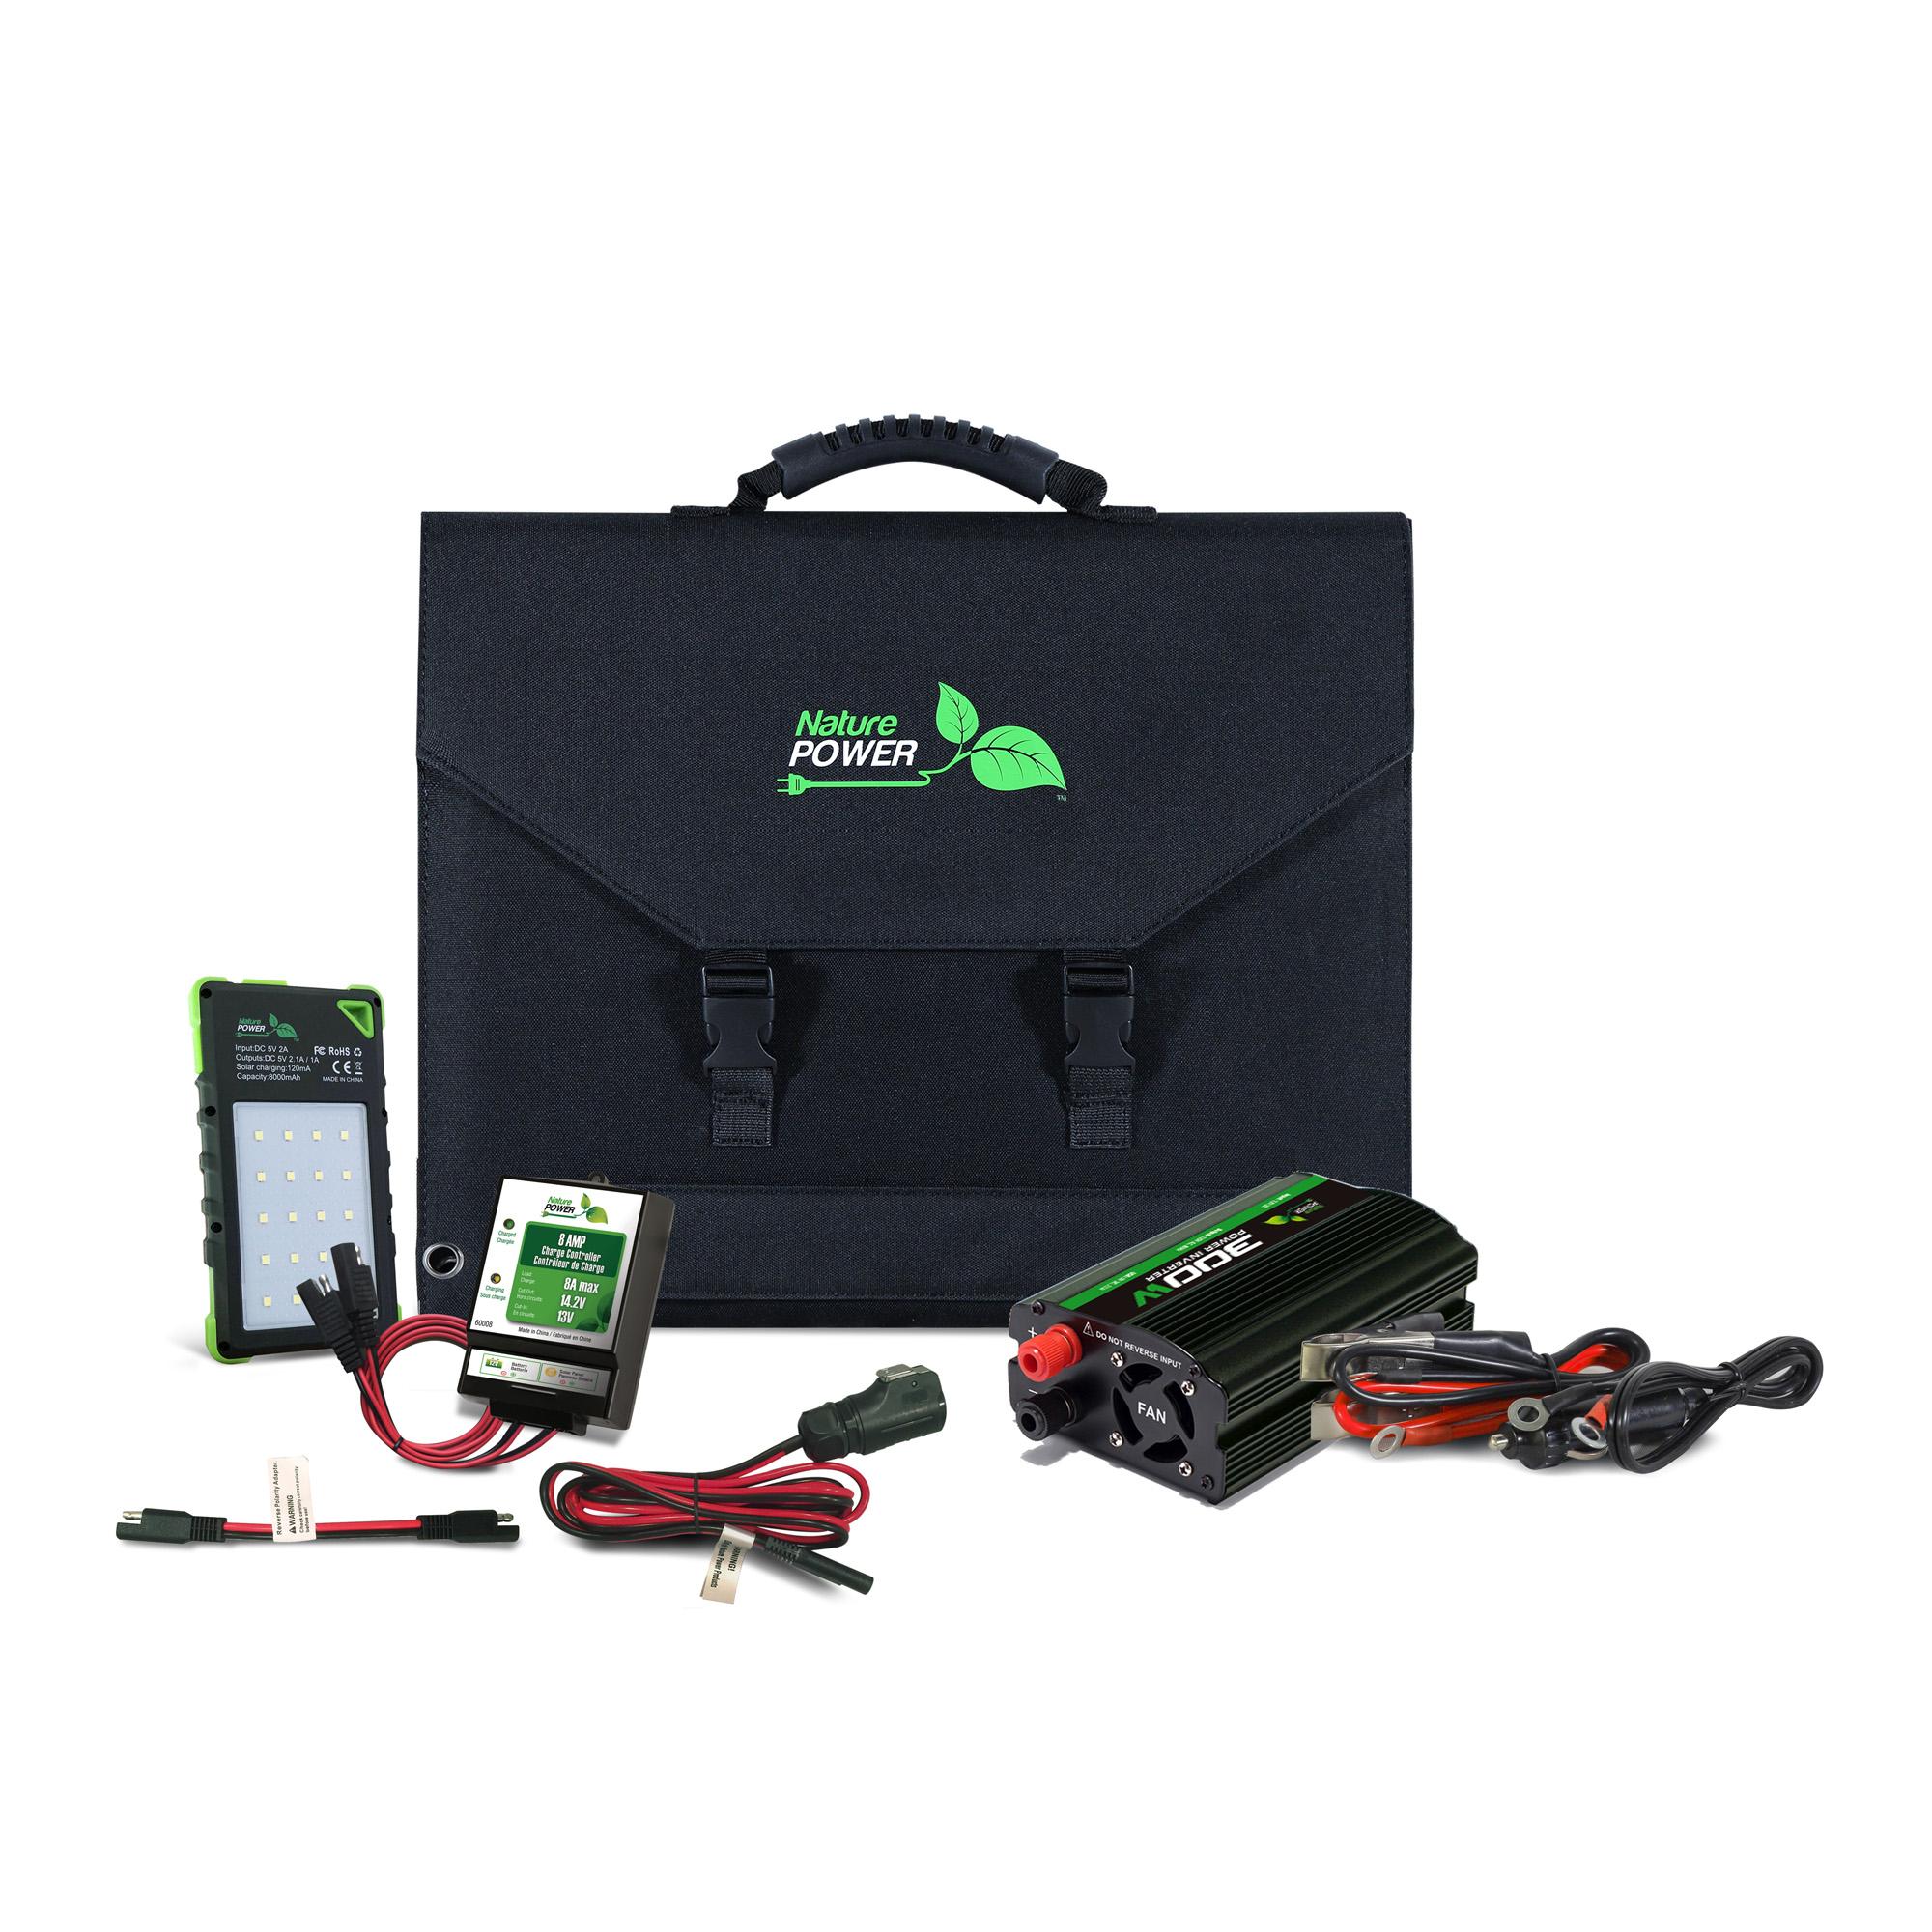 120 Watt Portable Folding Solar Panel Kit